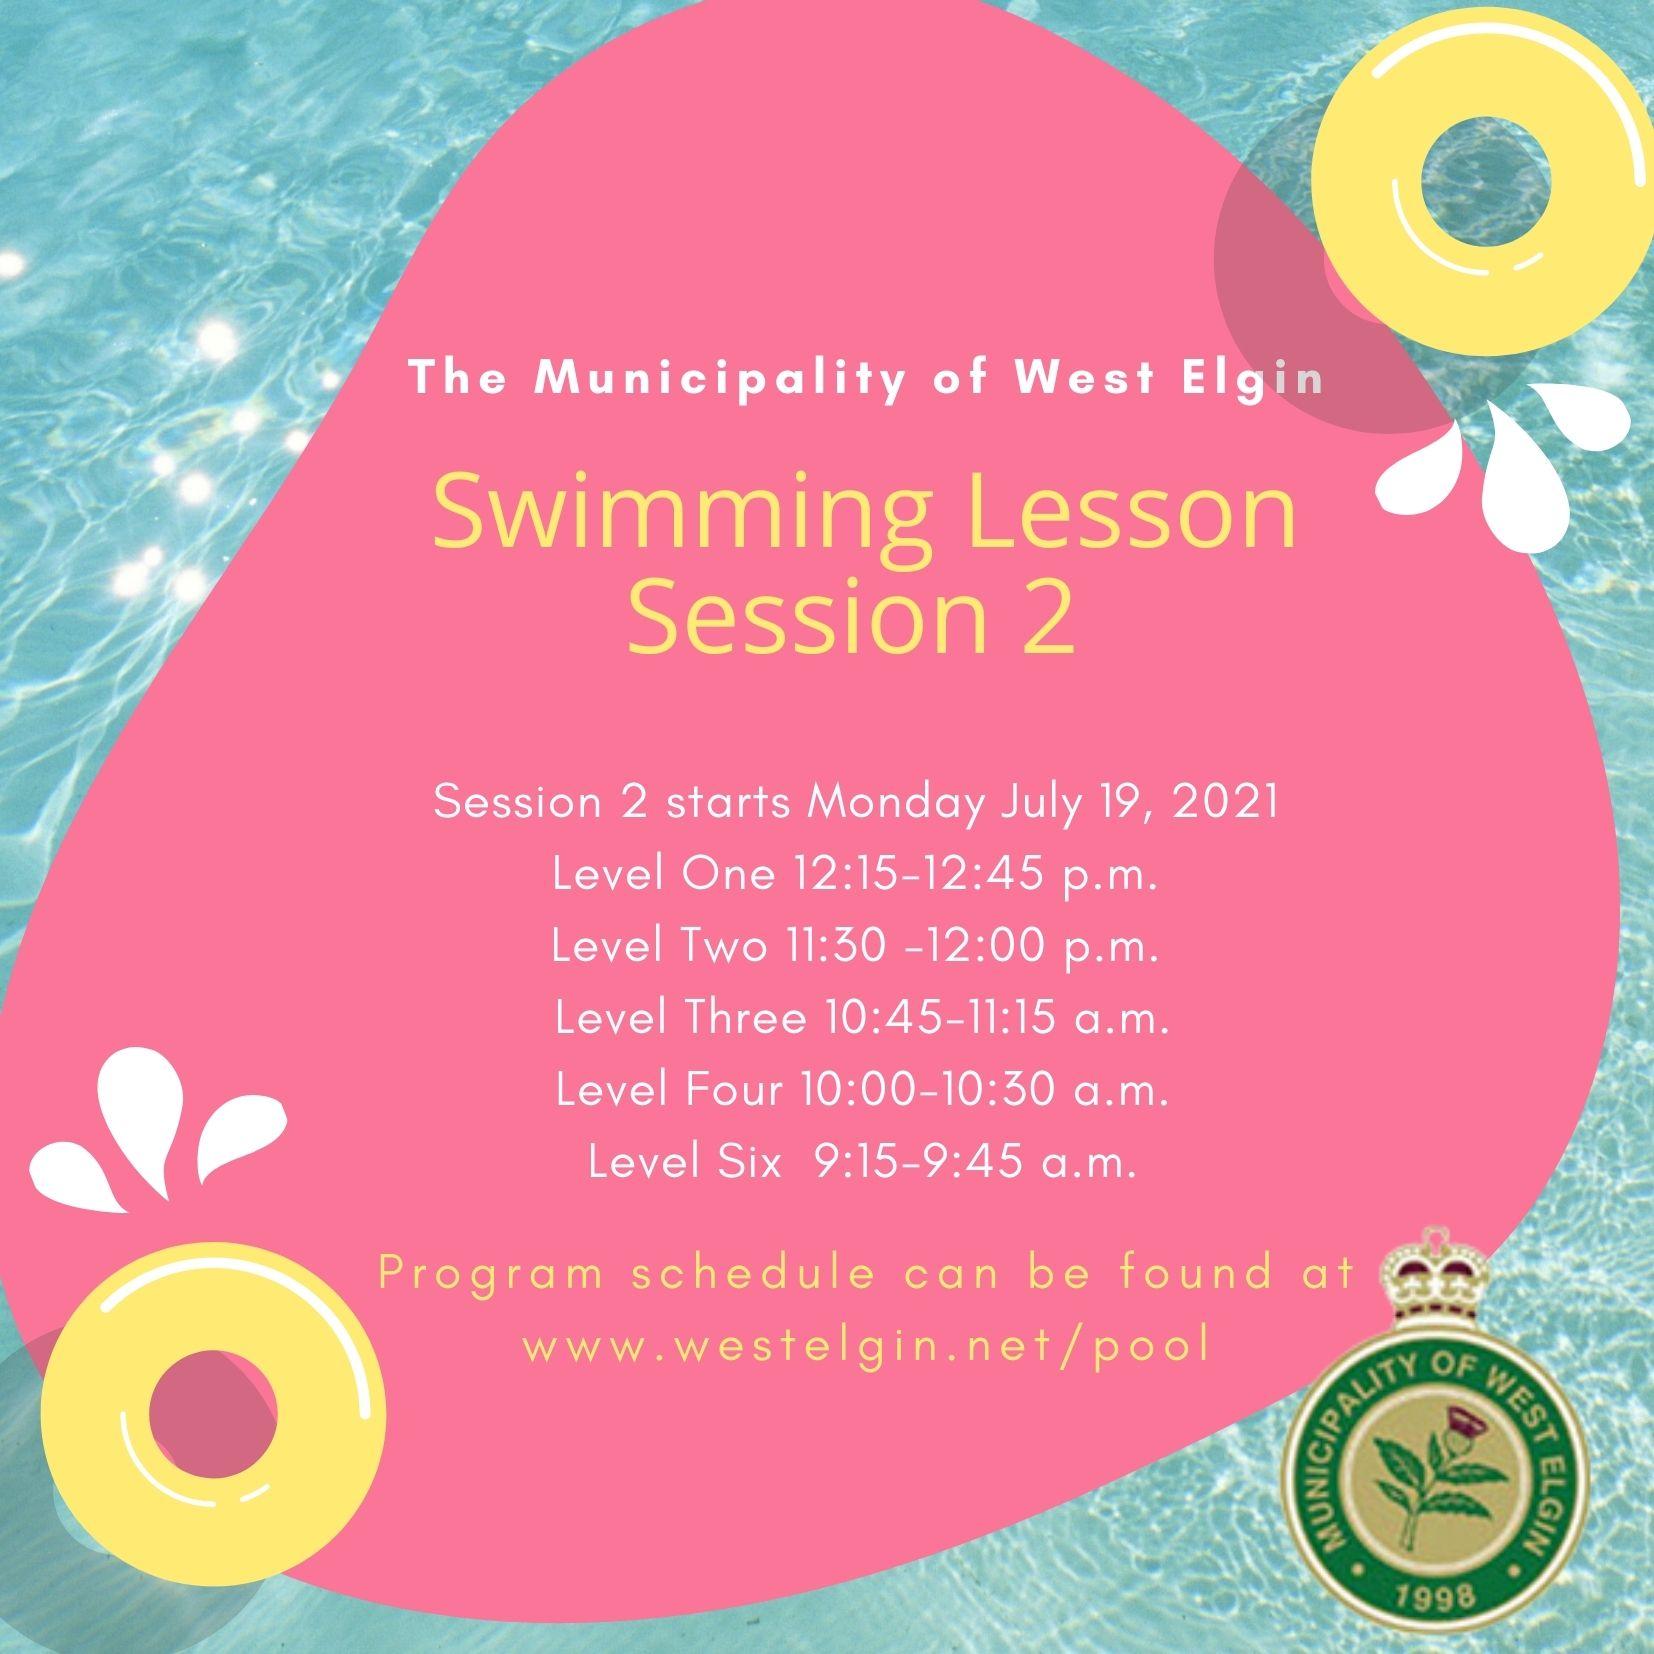 Swimming Lesson Reminder